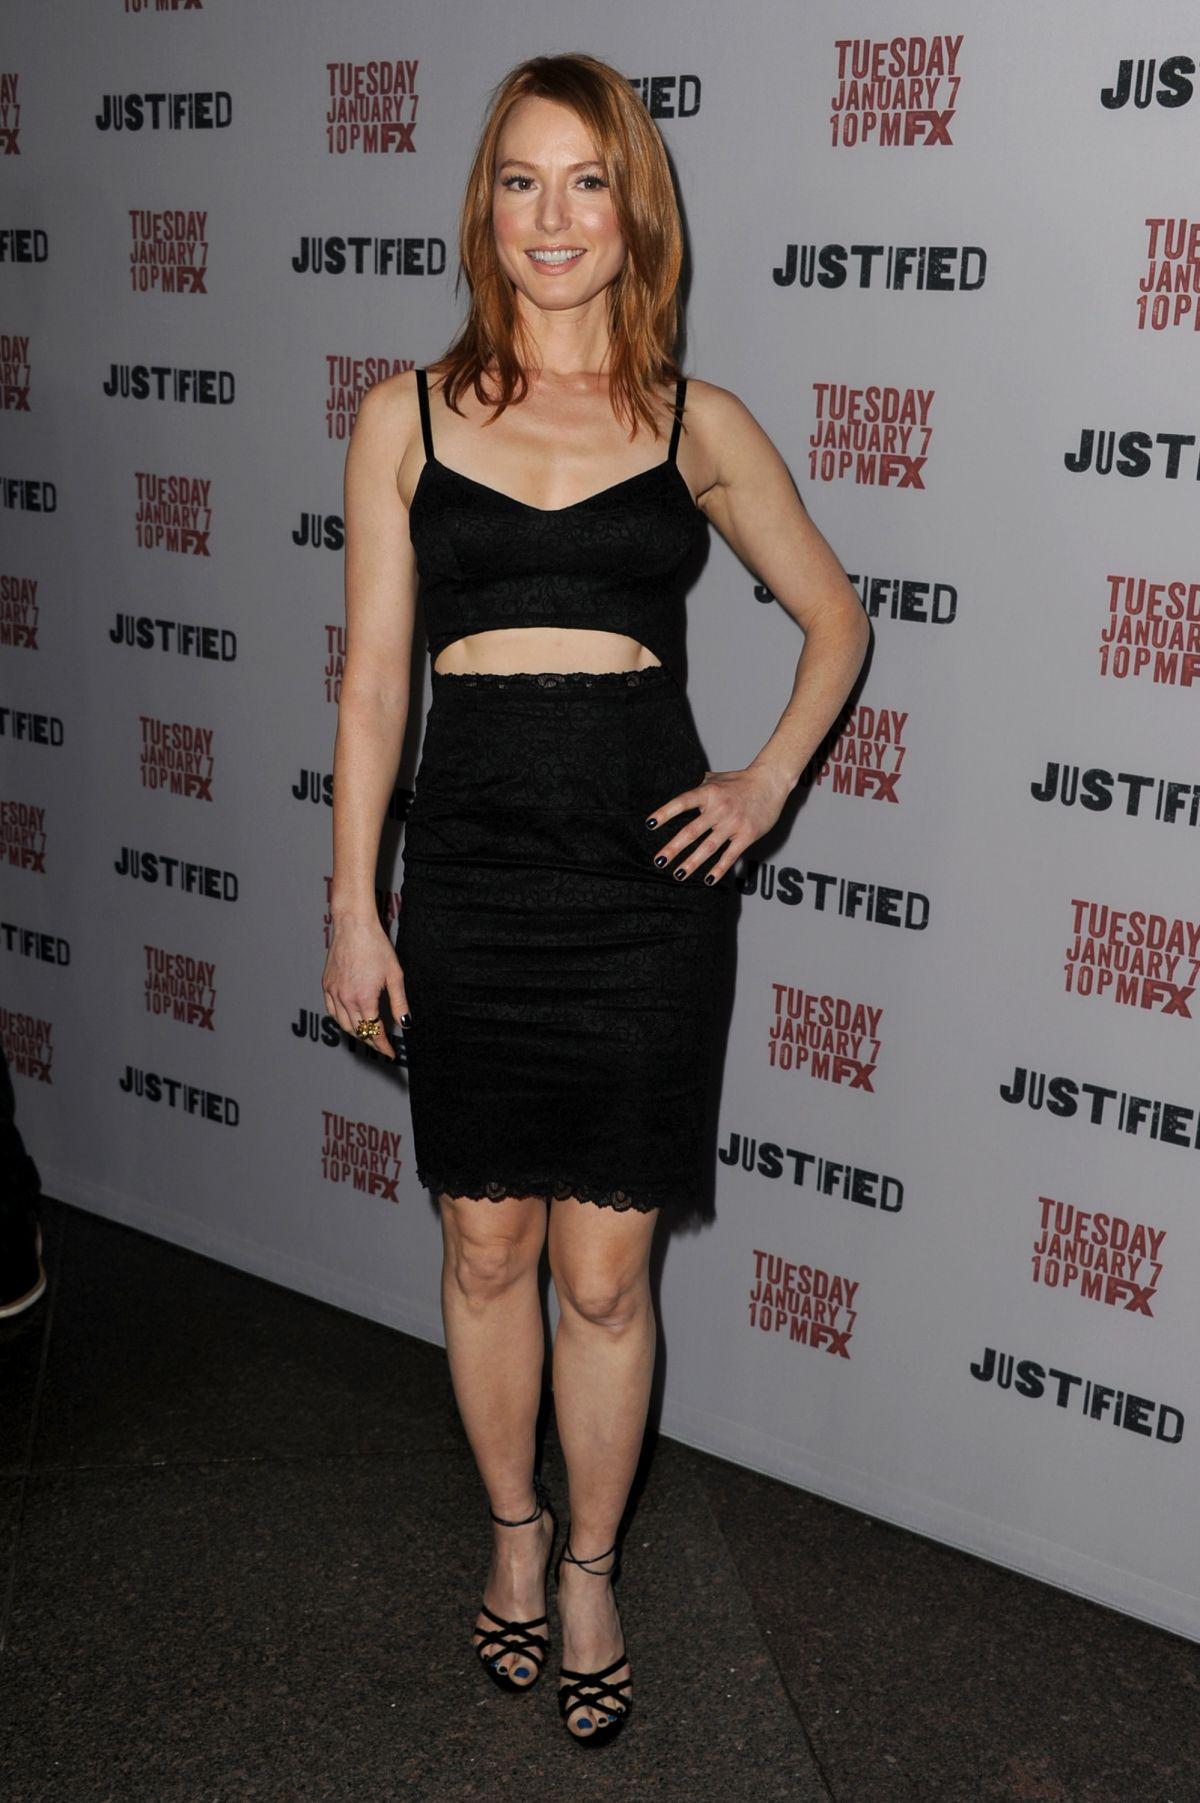 ALICIA WITT at Justified Season 5 Premiere in Los Angeles